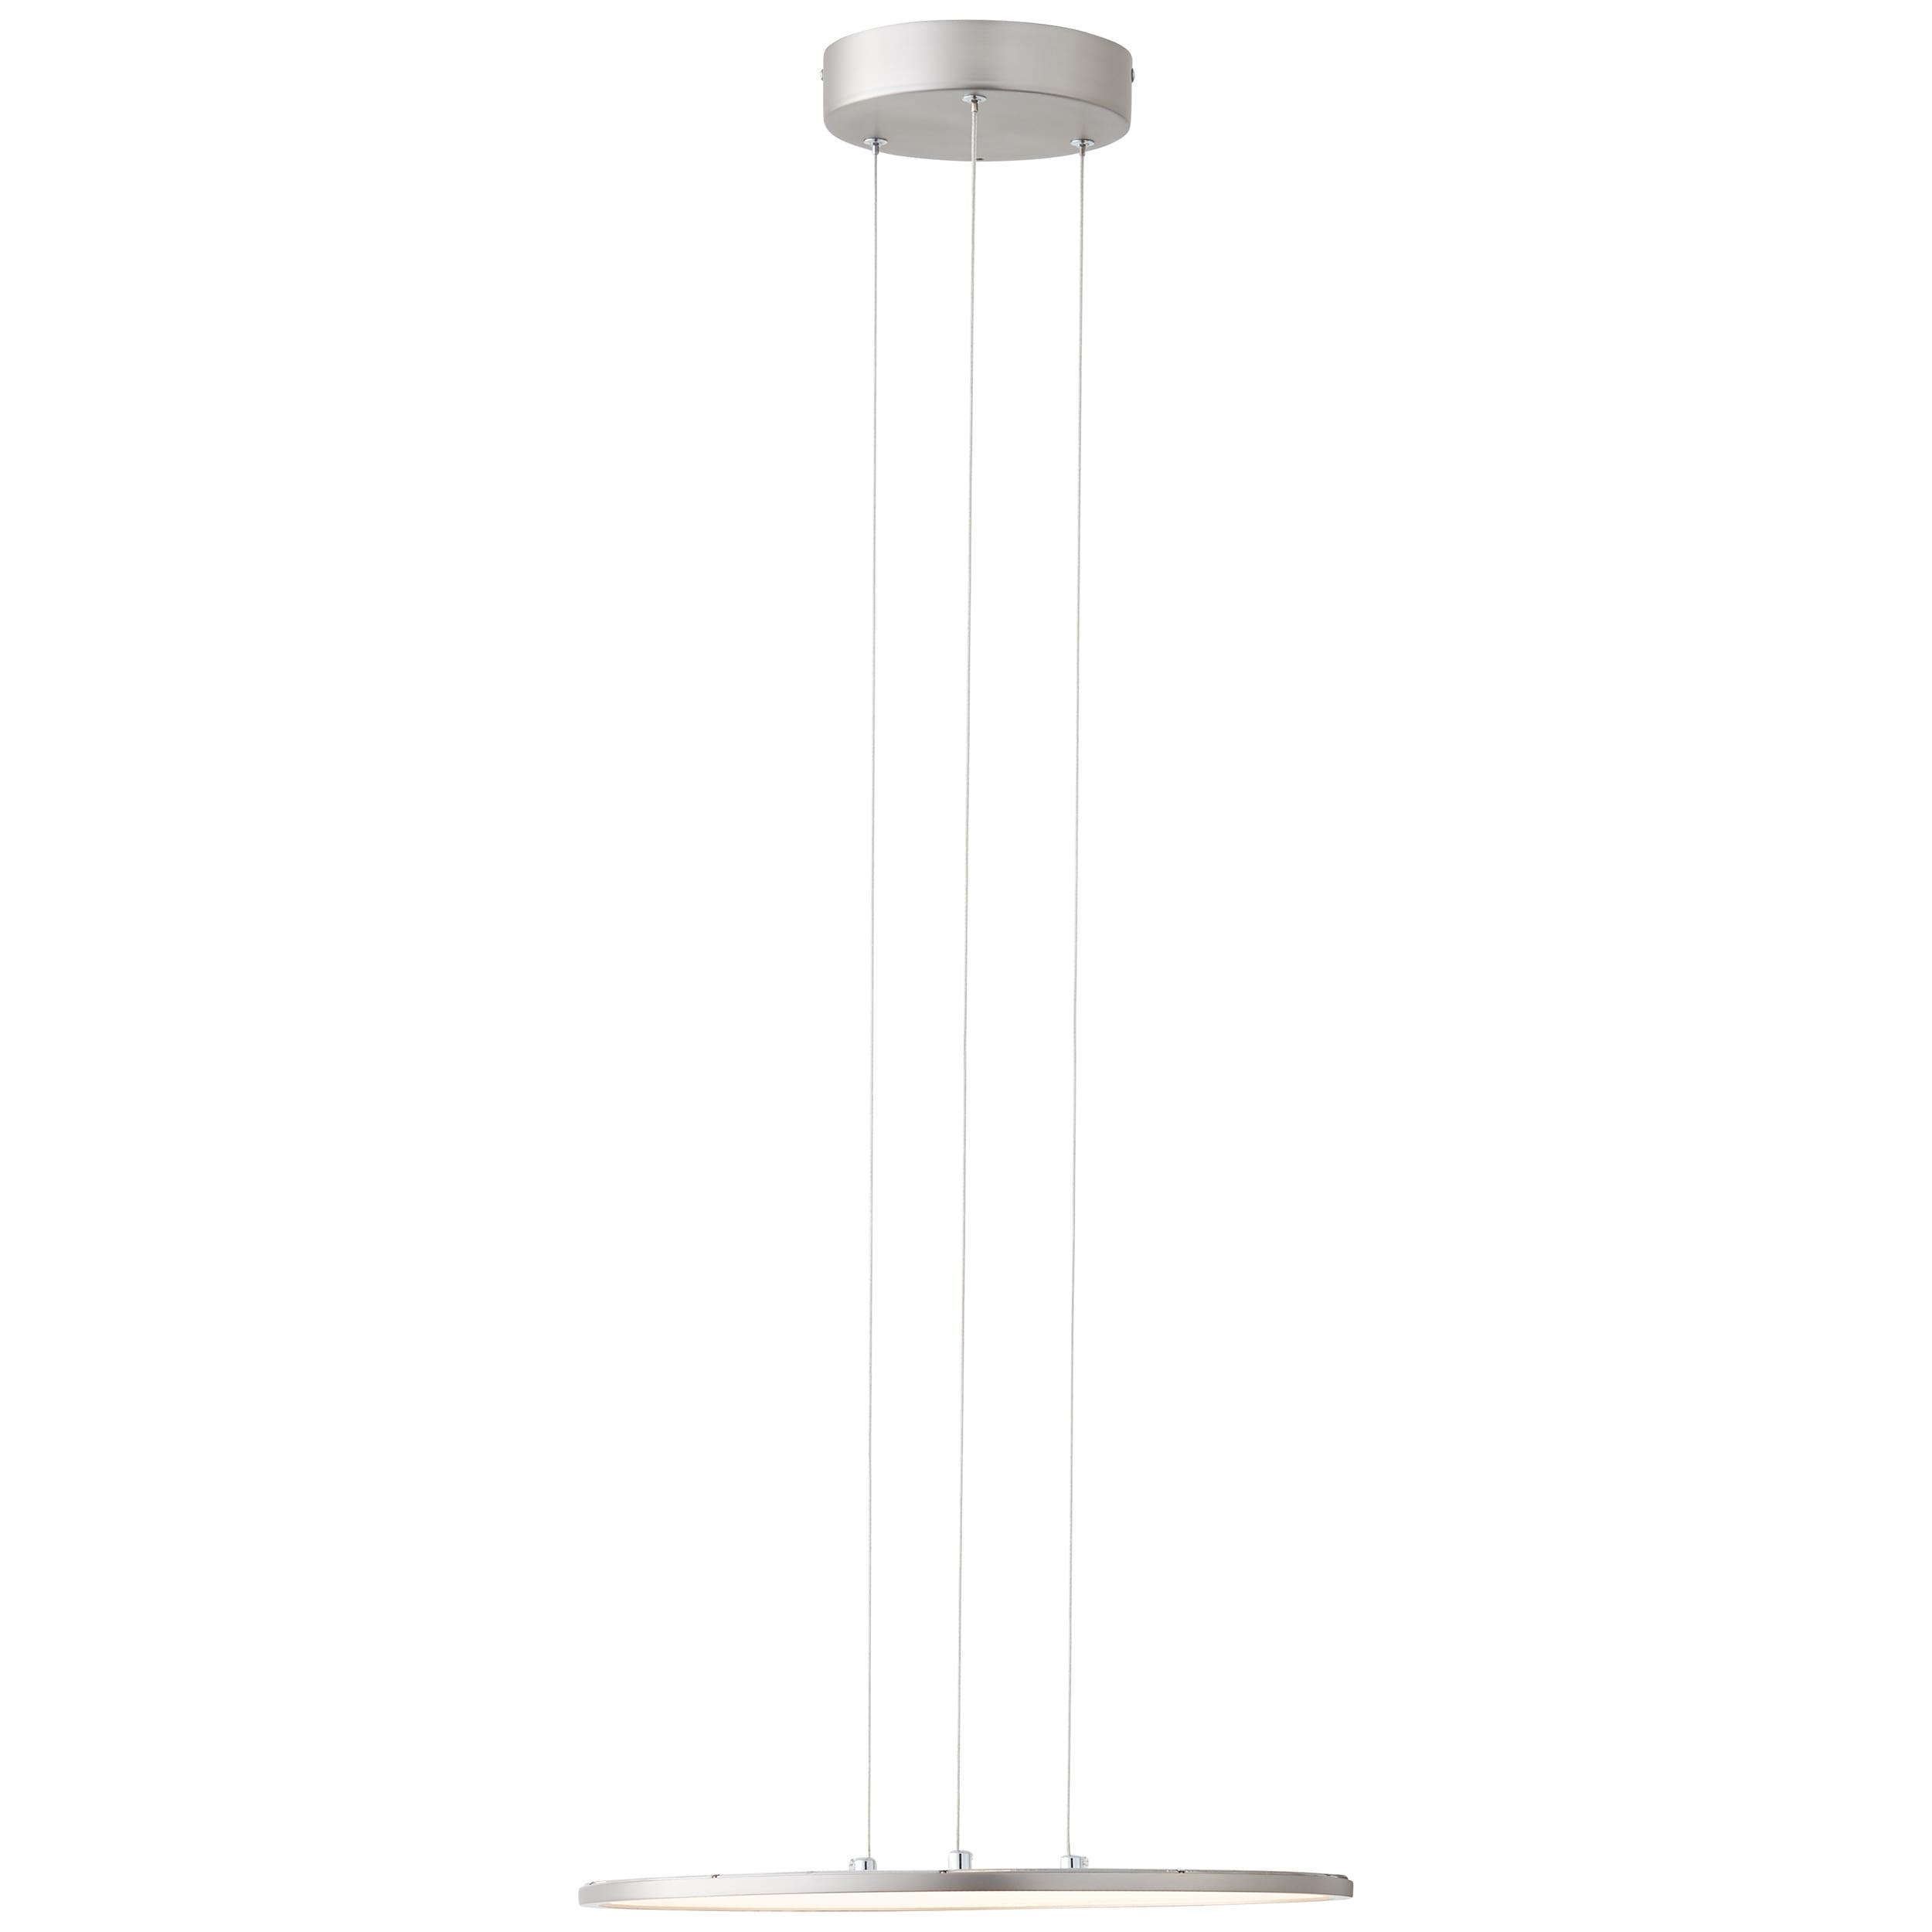 AEG Devin LED Pendelleuchte Paneel 45cm nickel/weiß WiZ-App